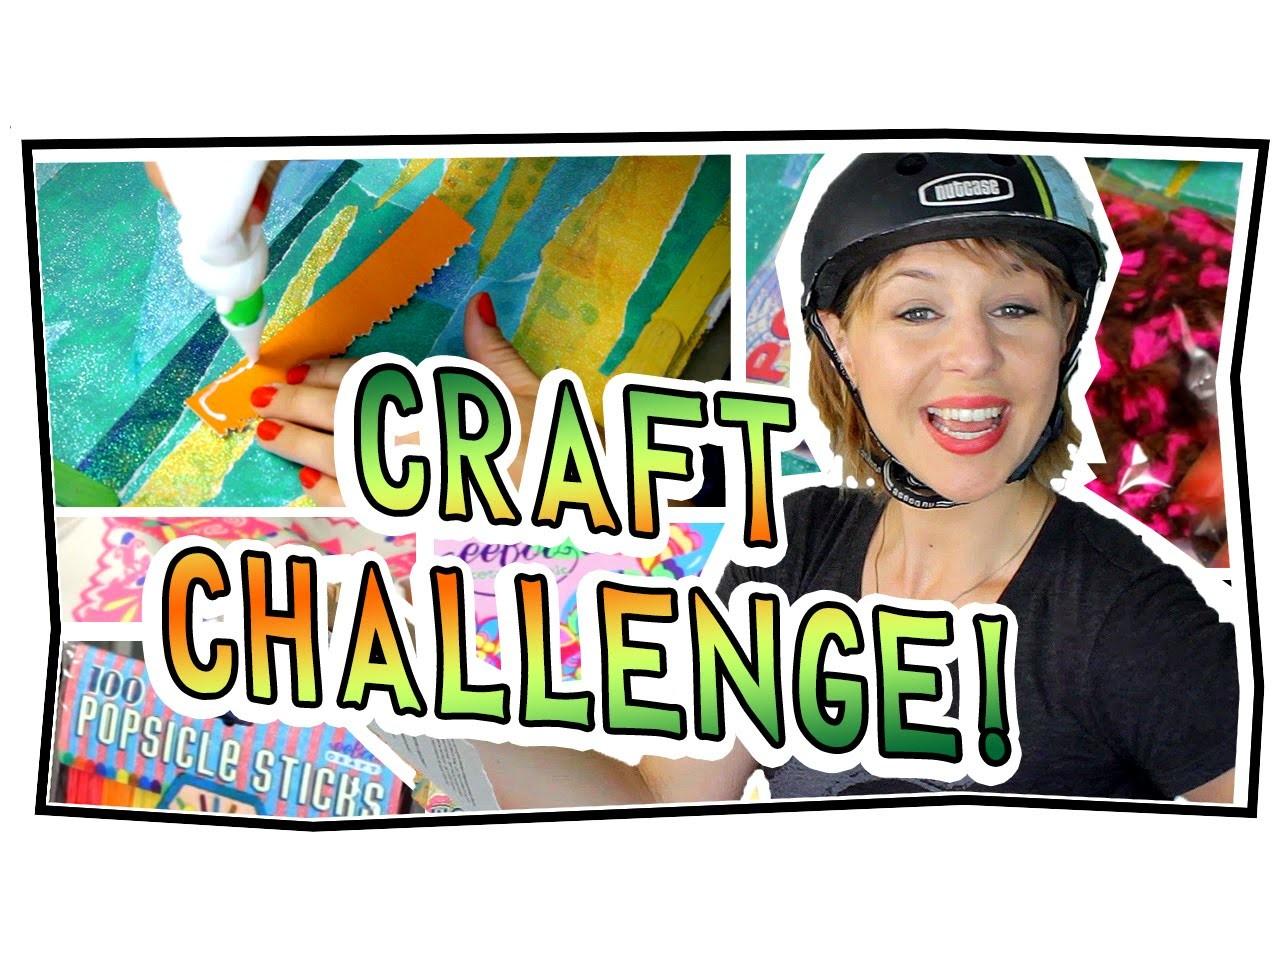 CRAFT CHALLENGE!!!